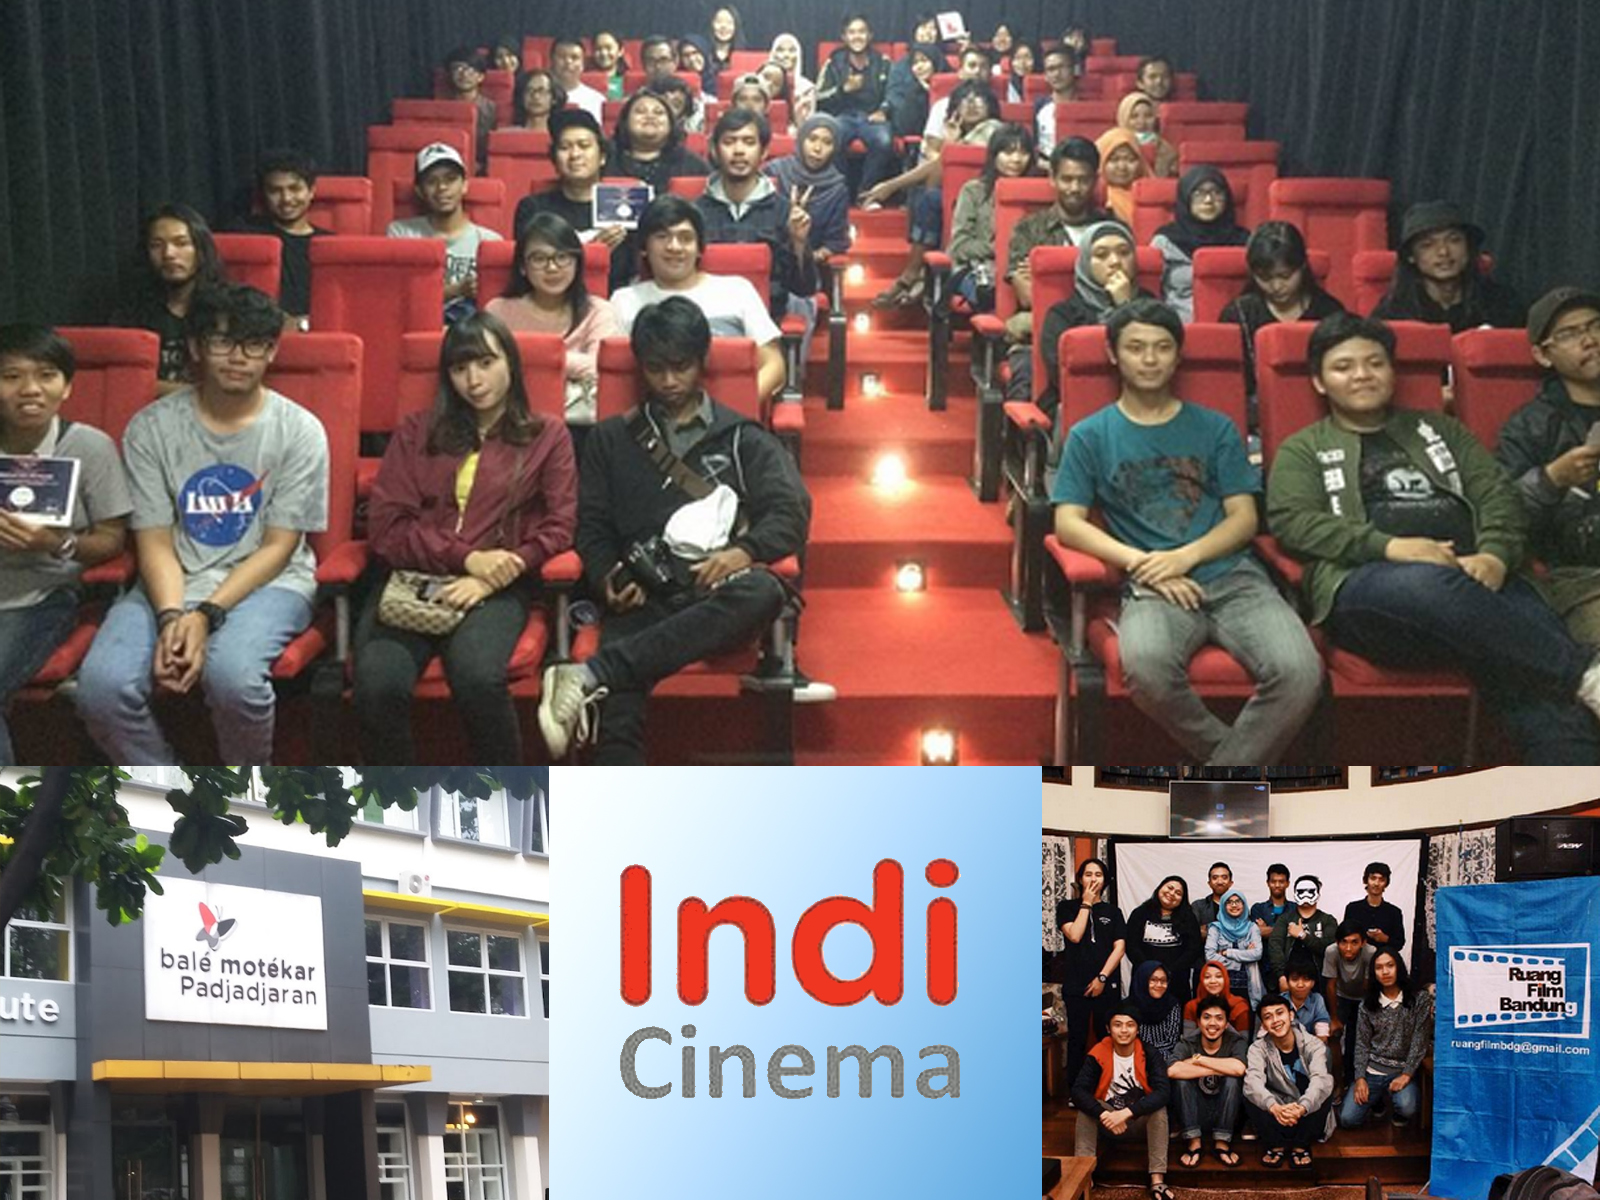 Bioskop film Indicinema di Bale Motekar Bandung